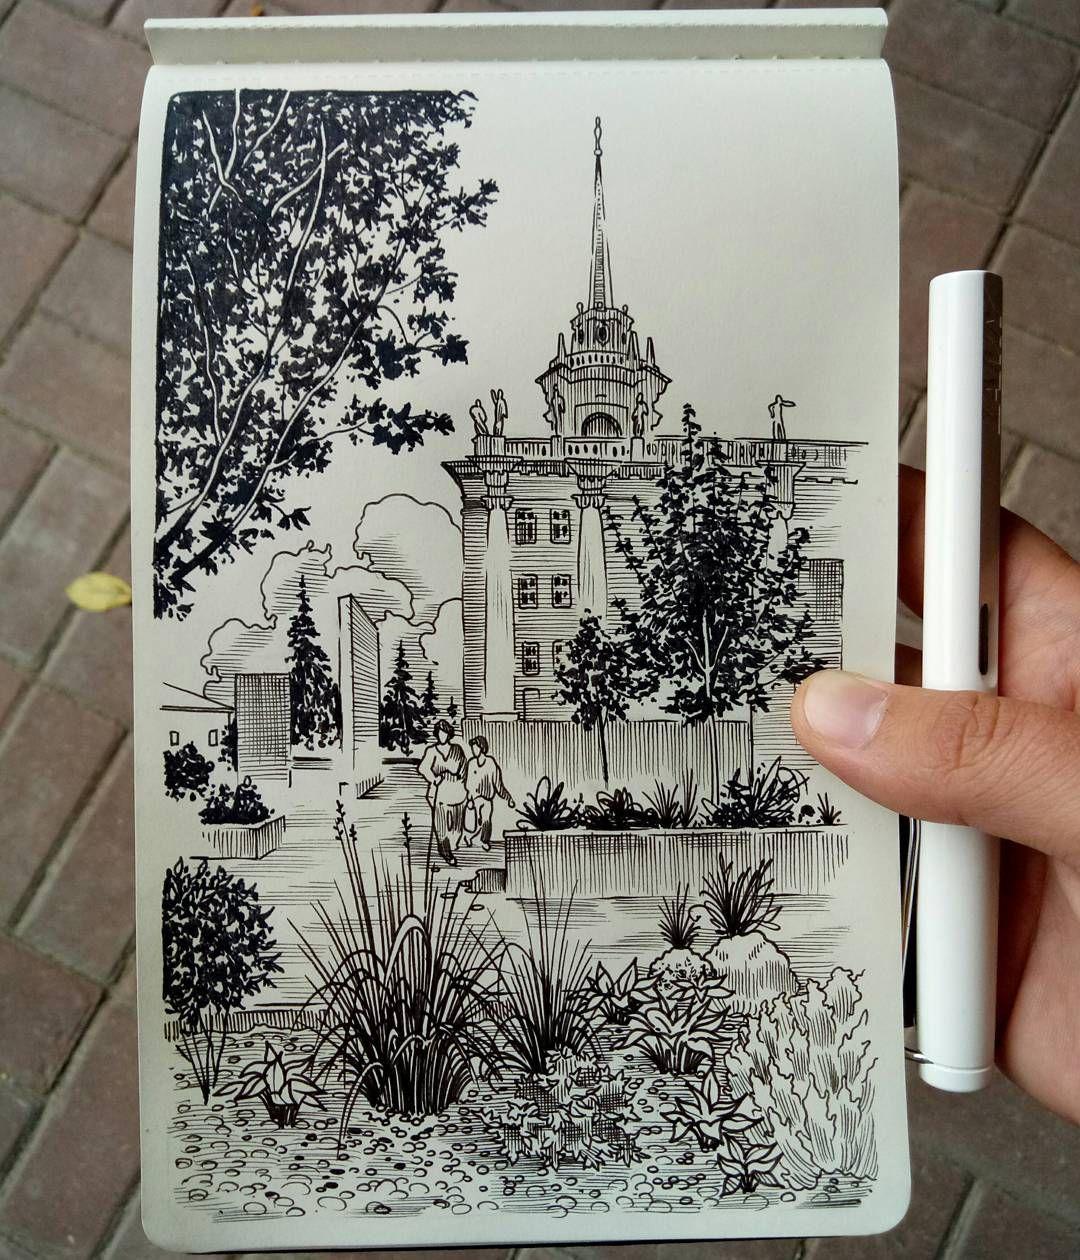 Sketch V Centre Goroda Sketch Risunok Grafika Sketch Sketchbook Moleskine Moleskine Arts Moleskin Risovani Pen Art Drawings Ink Pen Art Line Art Drawings